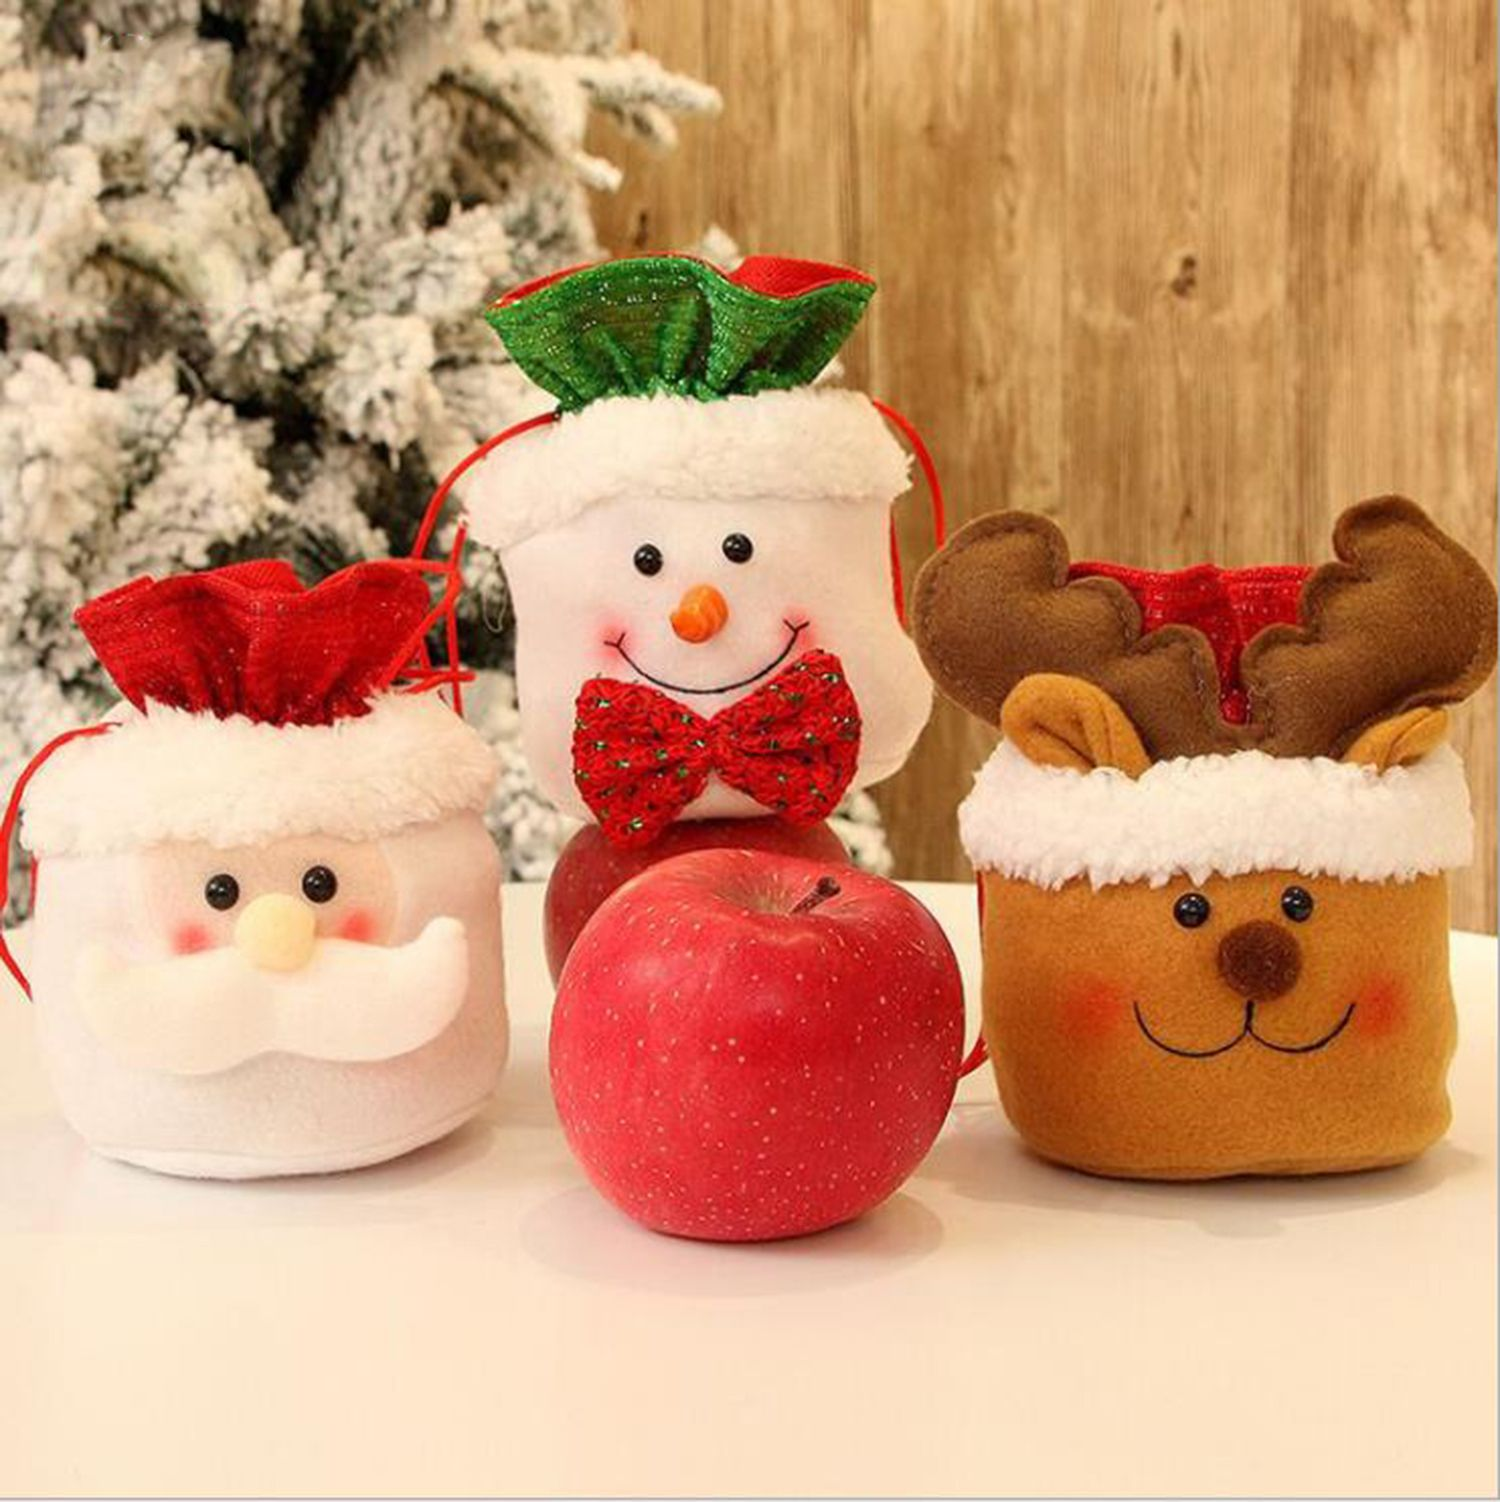 Christmas Decoration Bags Xmas Snowman Apple Bag Eve Apple Box Gift Bags Cute